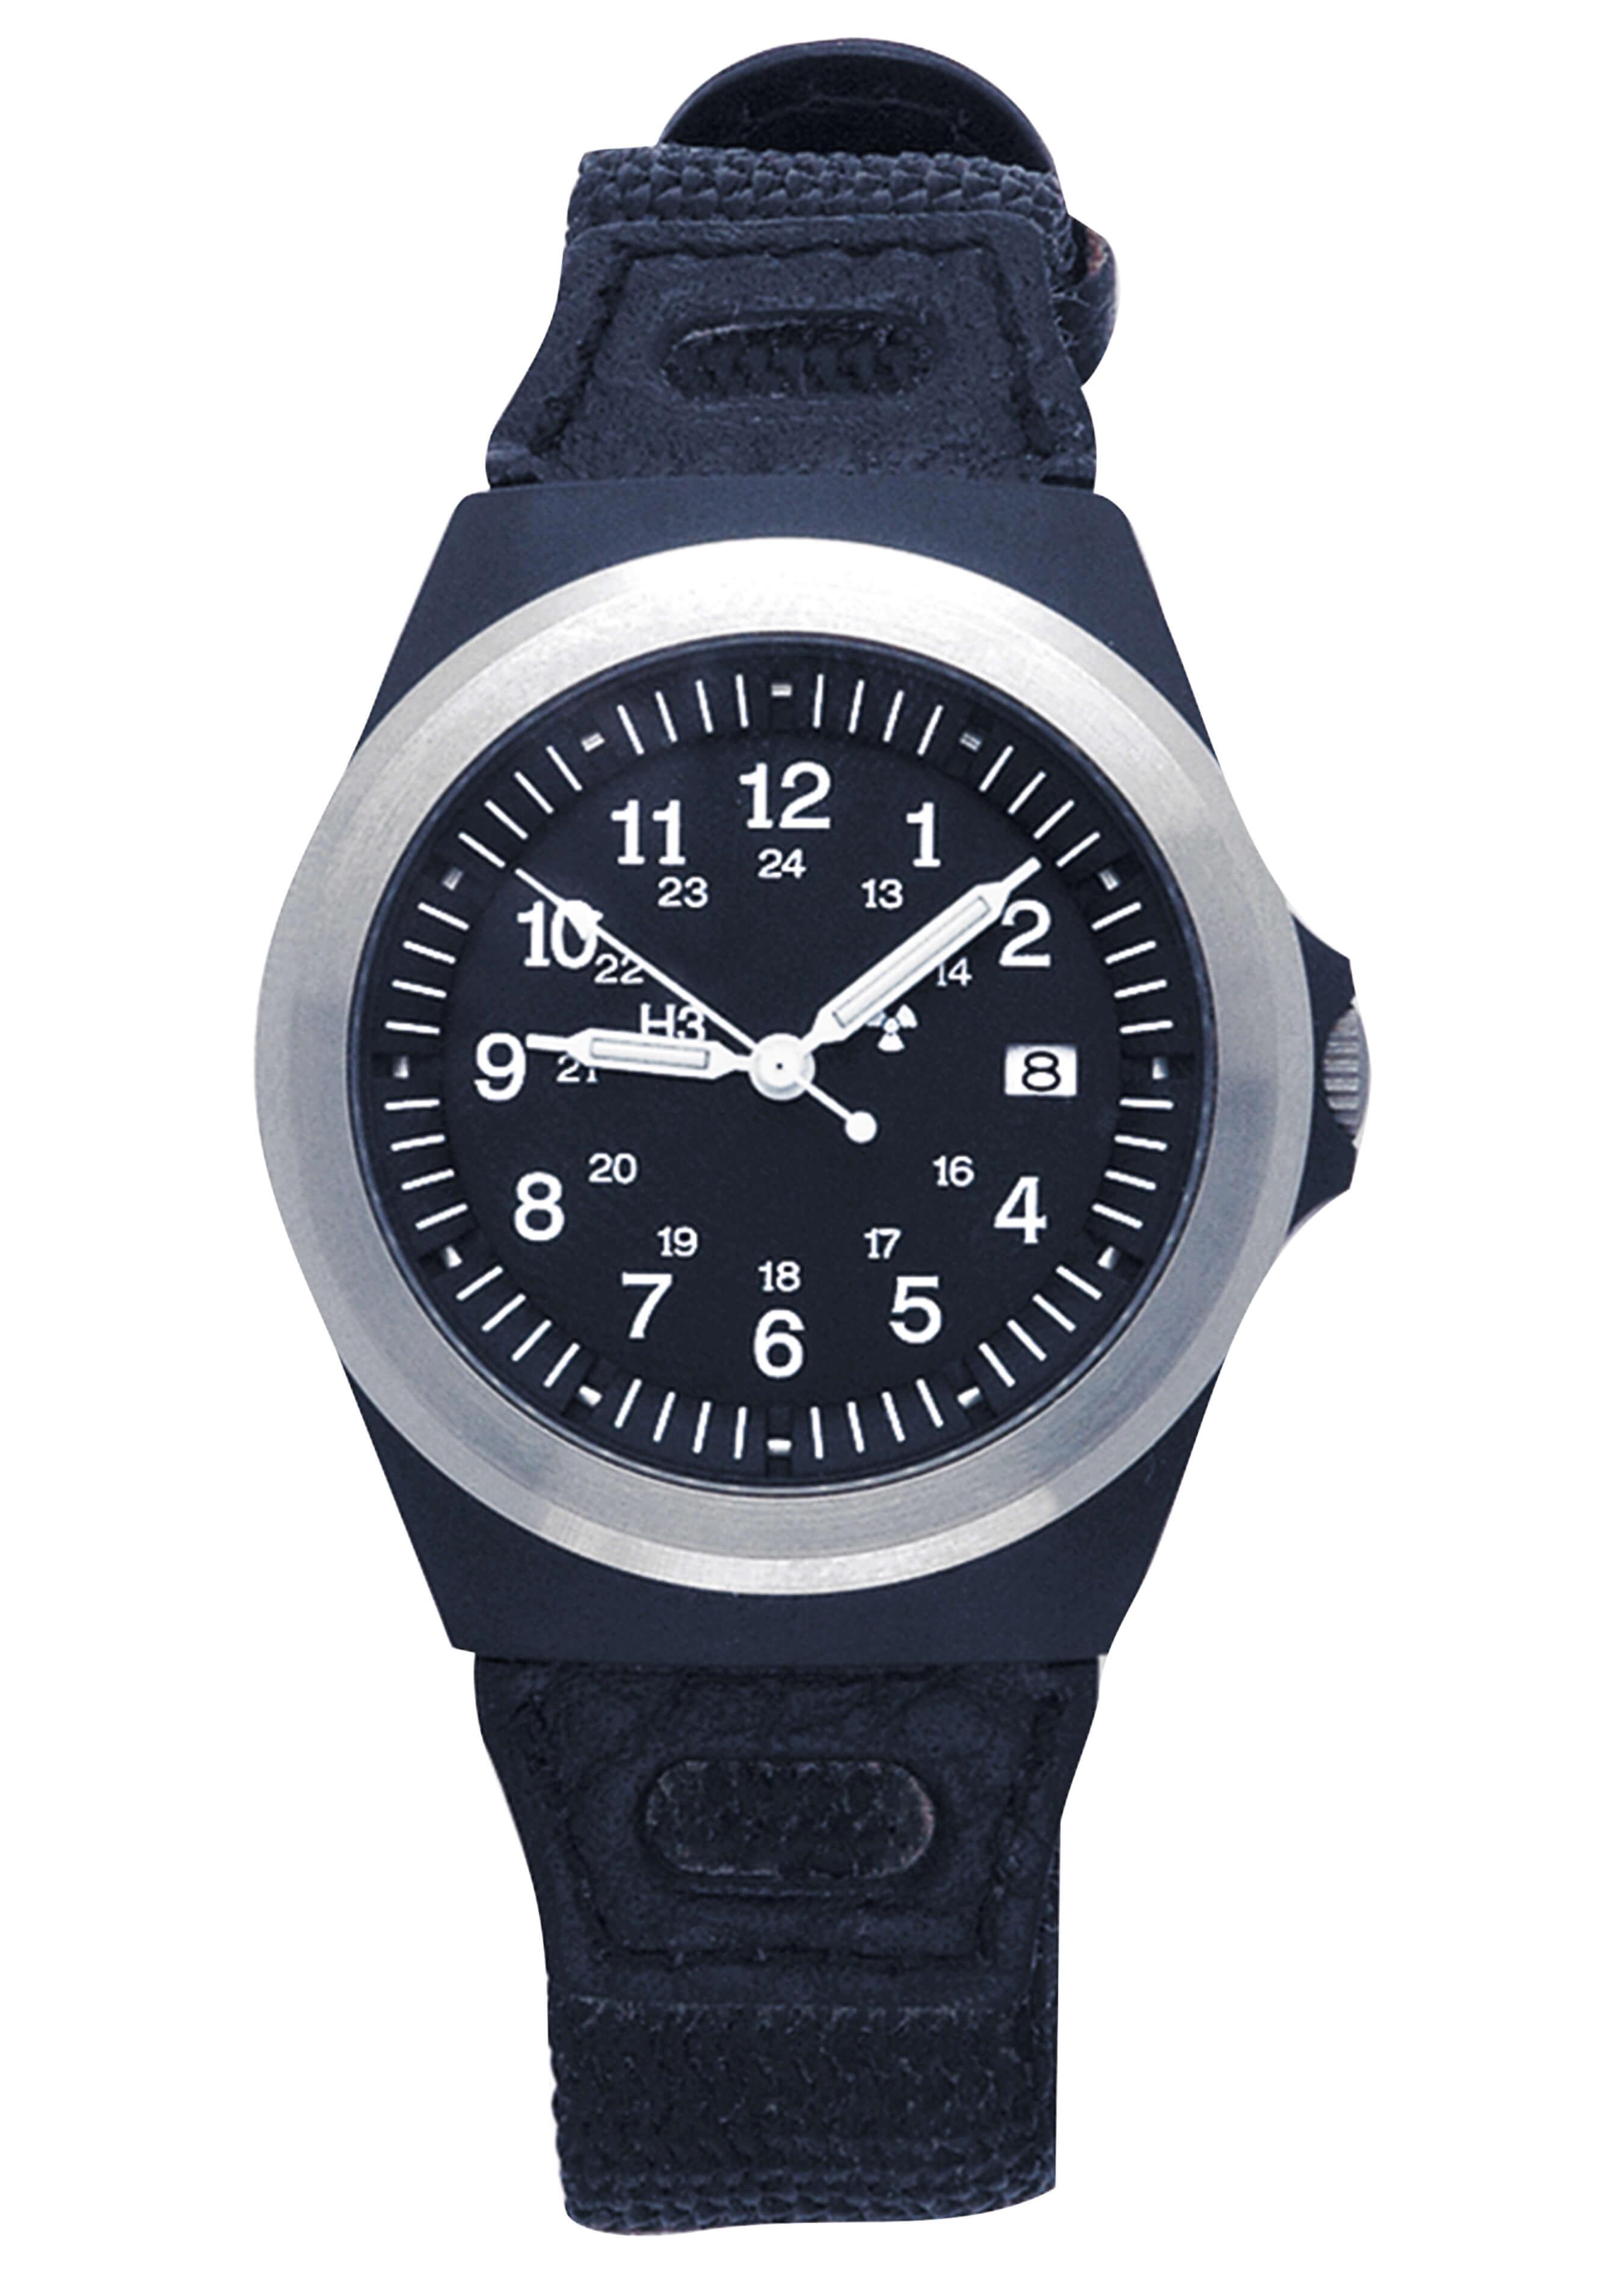 Traser Uhren Armbanduhr H3 mit Beleuchtung grün L2052 1